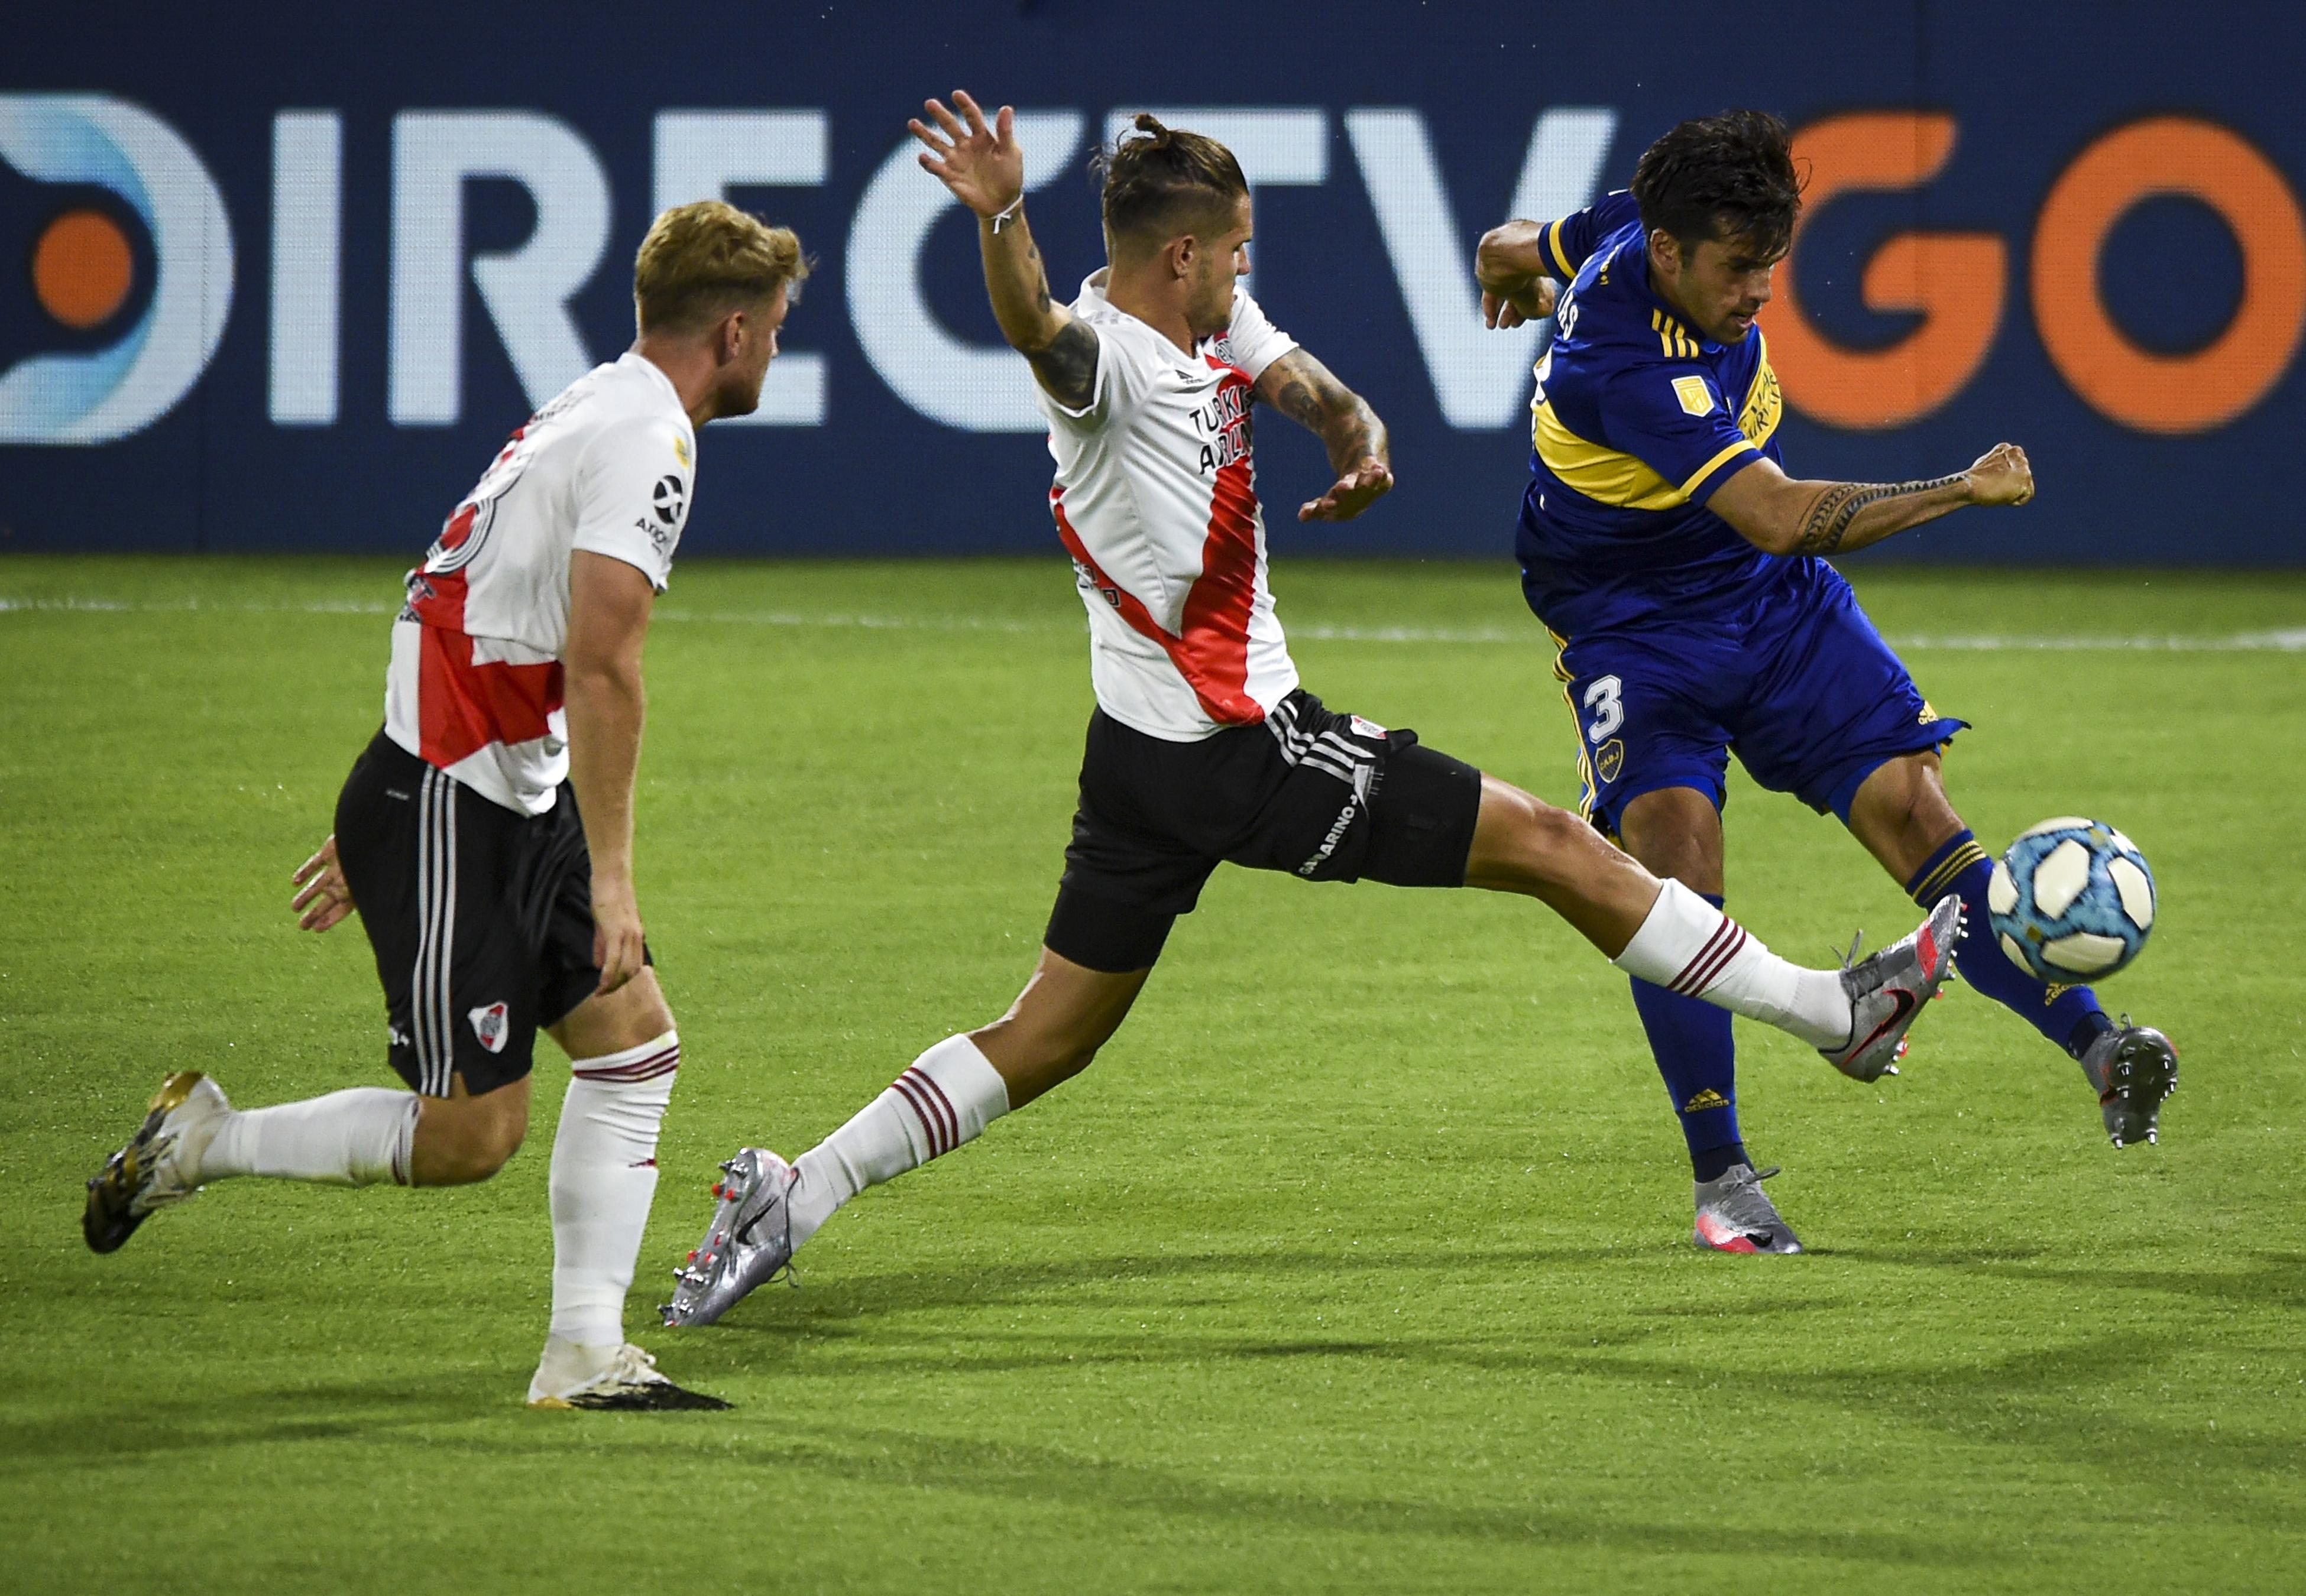 Zuculini intenta asfixiar a Mas, que apela al rechazo para eliminar el peligro (REUTERS/Marcelo Endelli)